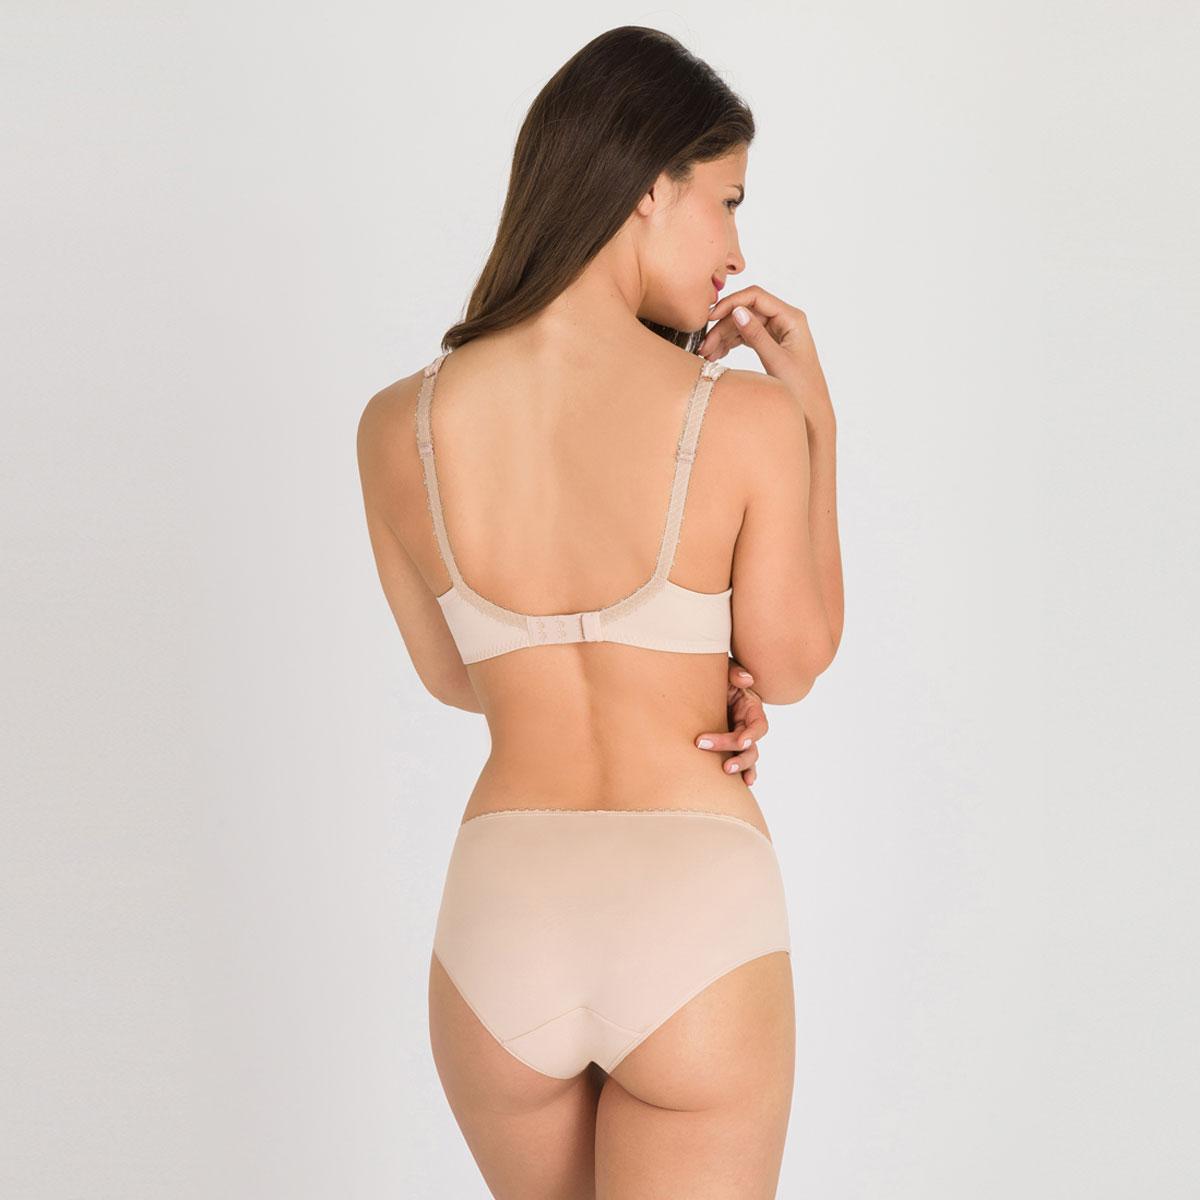 Soutien-gorge spacer sans armatures beige - Flower Elegance-PLAYTEX